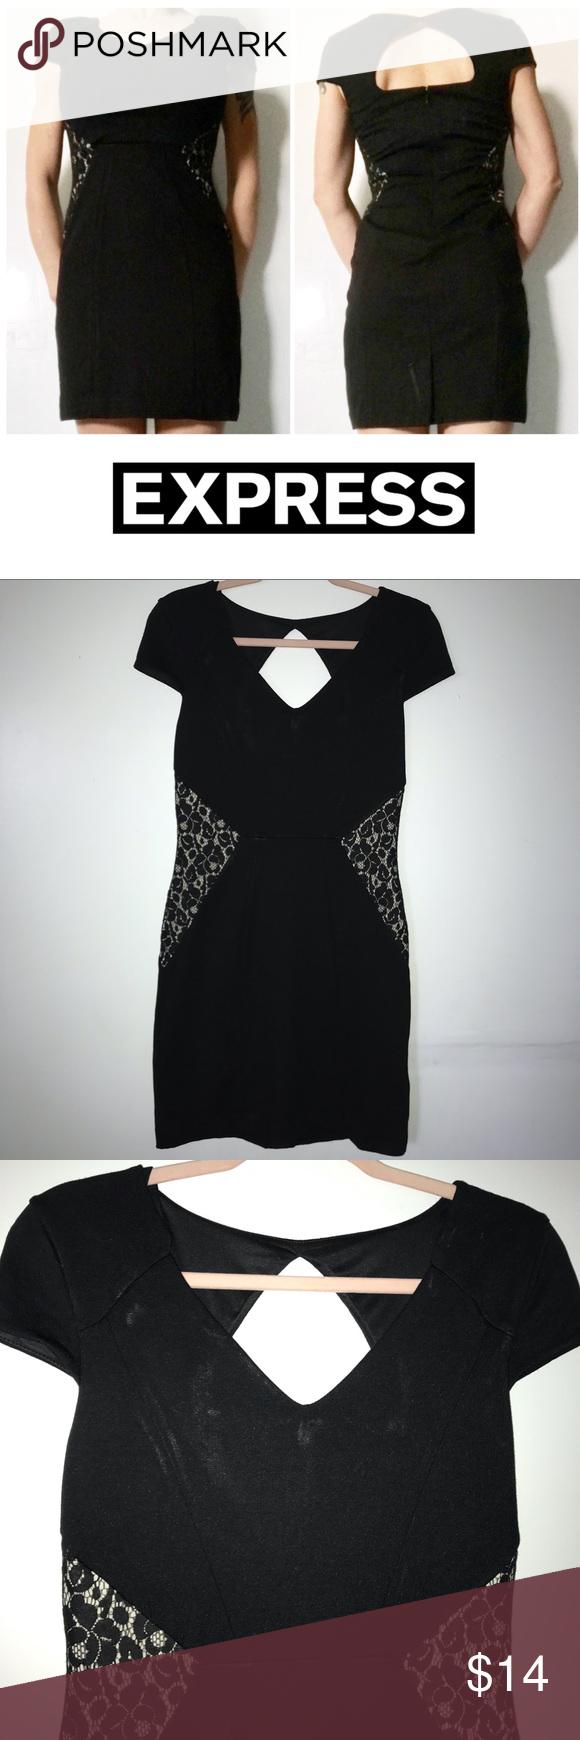 Express Black Cream Lace Detail Mini Dress 6 Small Dress Size Chart Women Mini Velvet Dress Express Bodycon Dress [ 1740 x 580 Pixel ]